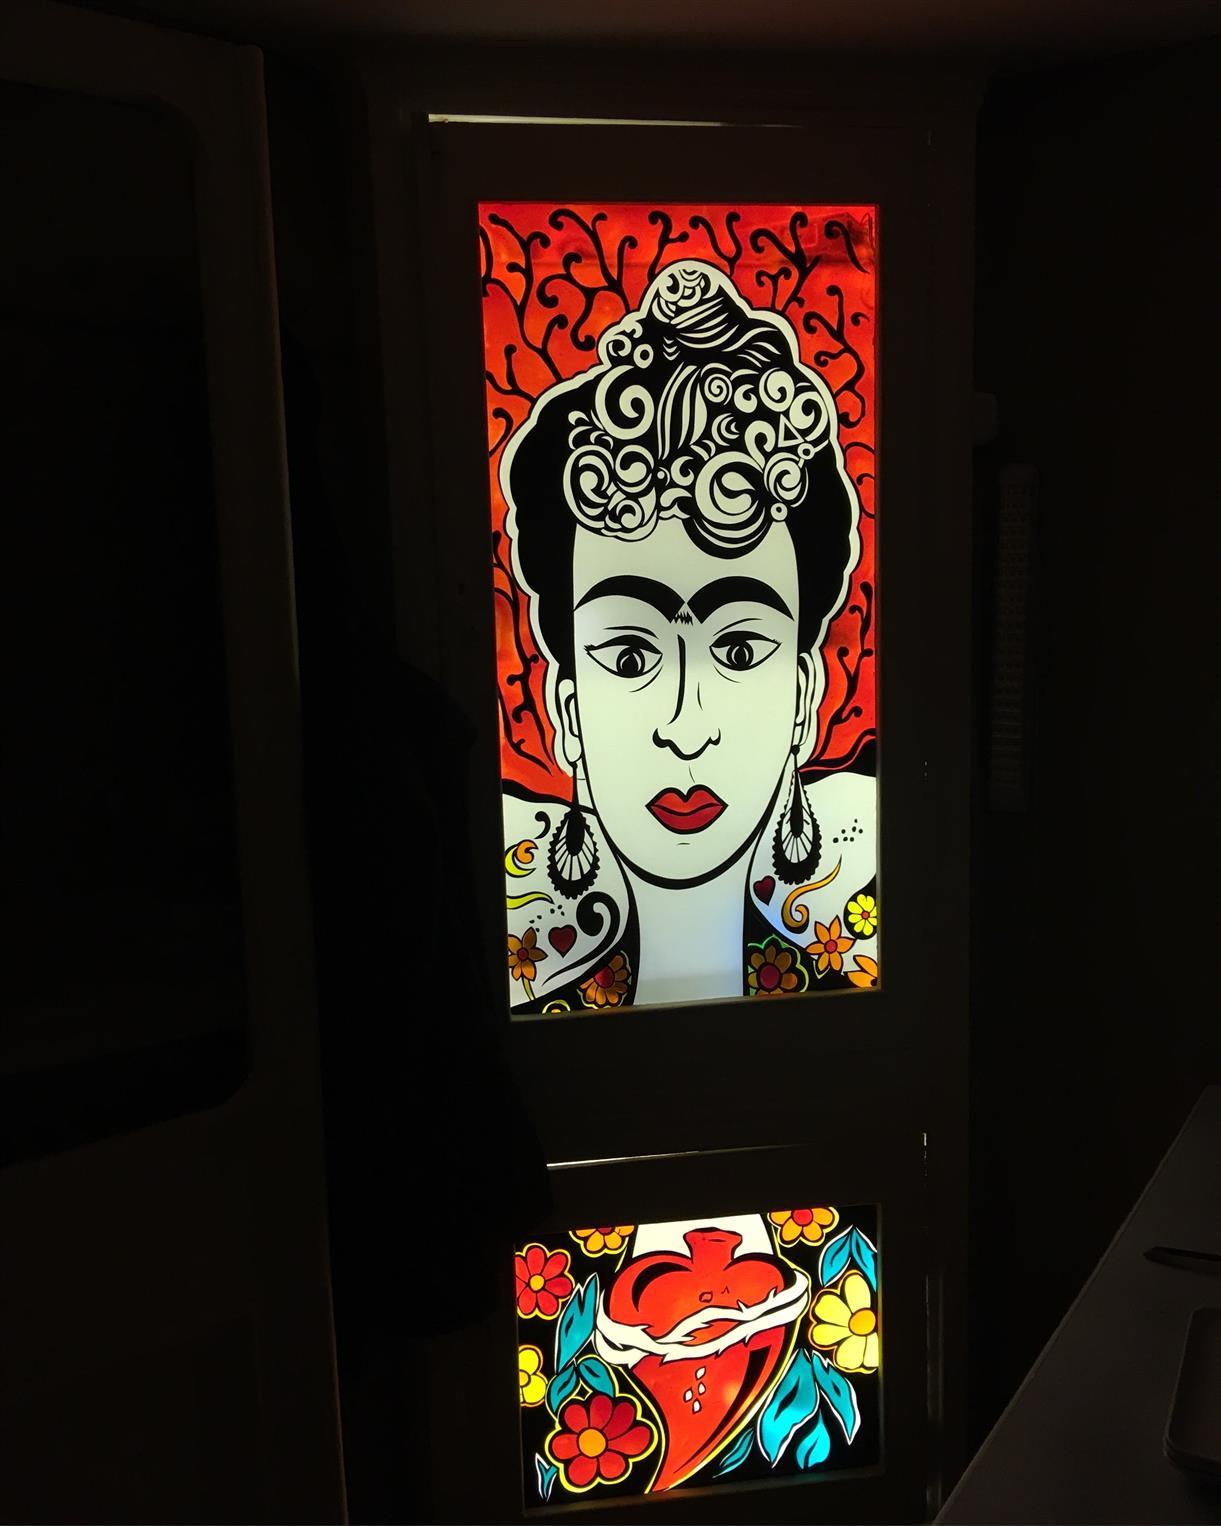 maitia-restoran-guzelyali2016521359991.jpg izmir vitray çalışması